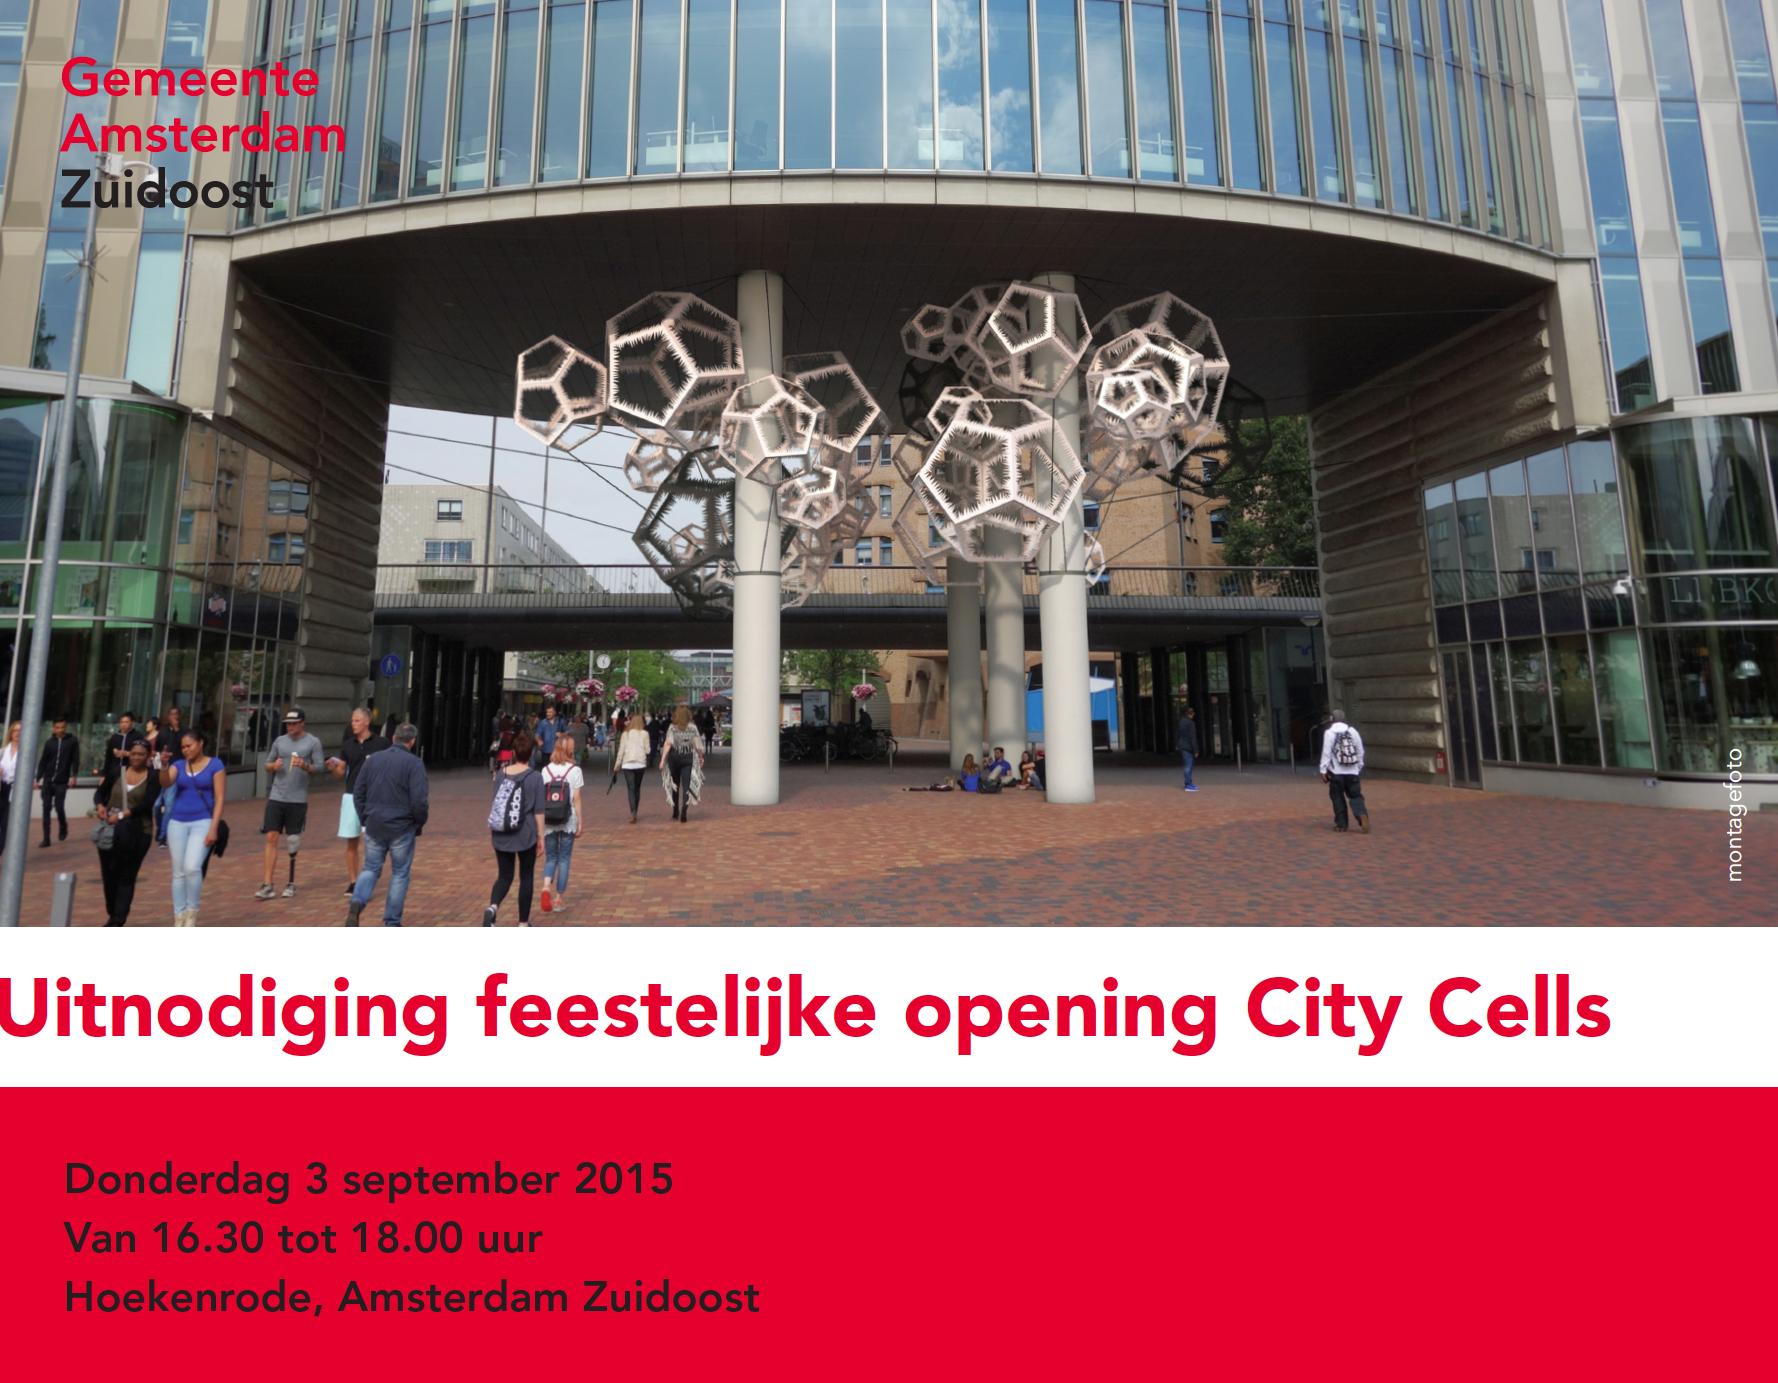 City Cells Hoekenrode Amsterdam_Karin van Dam